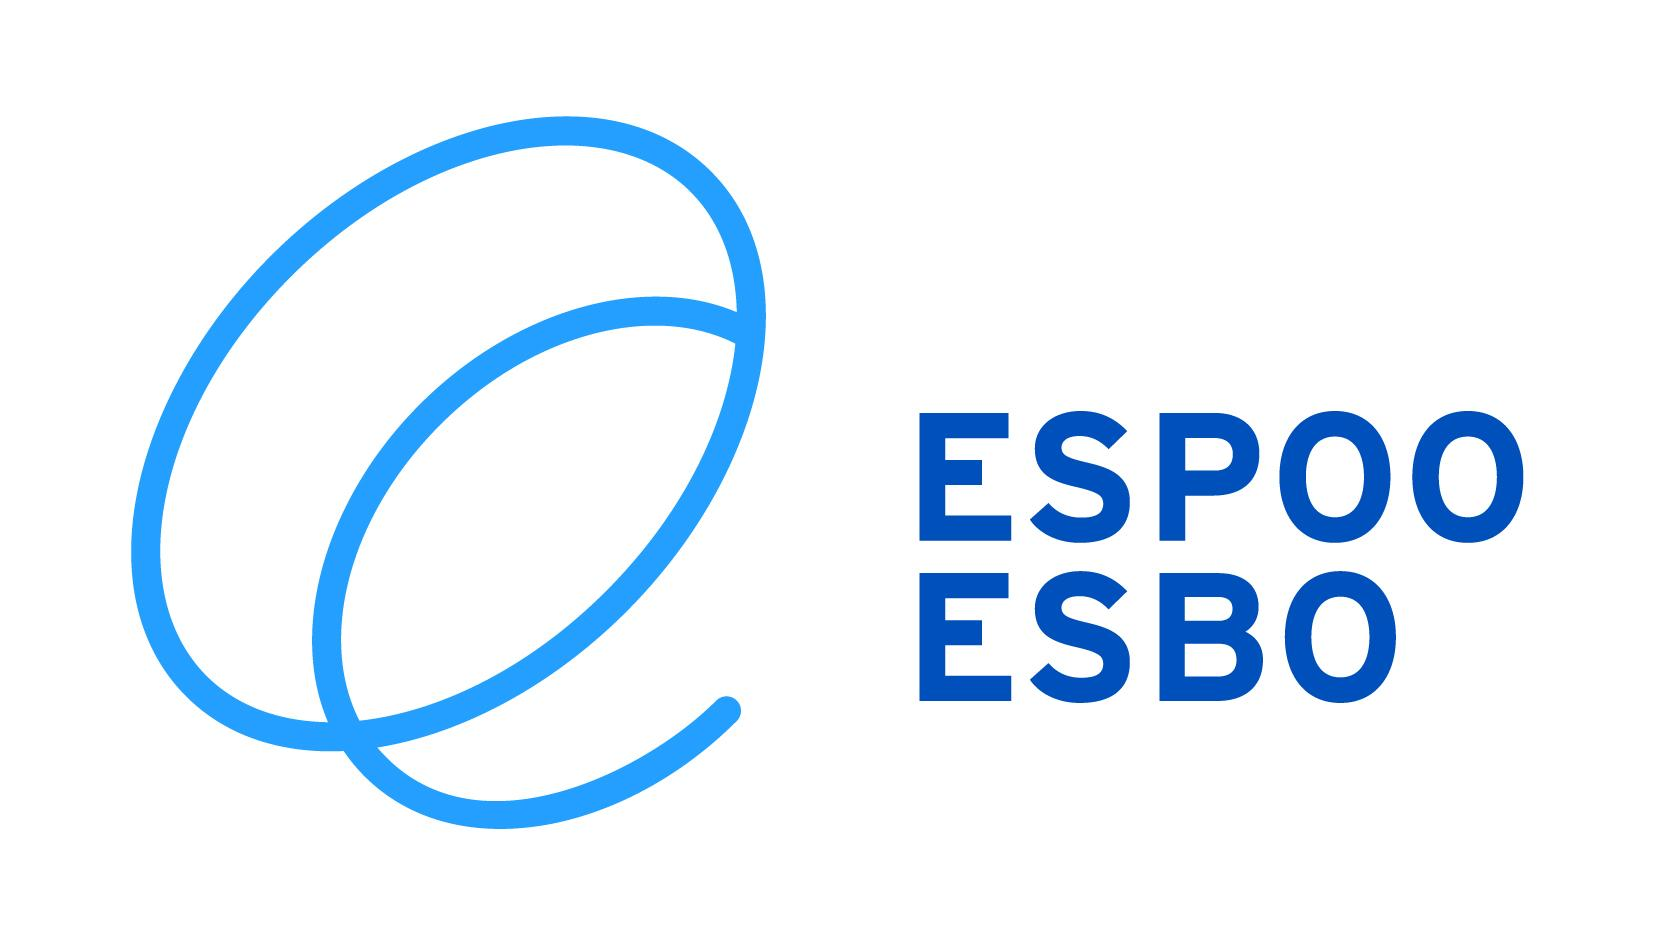 Espoon kaupungin logo